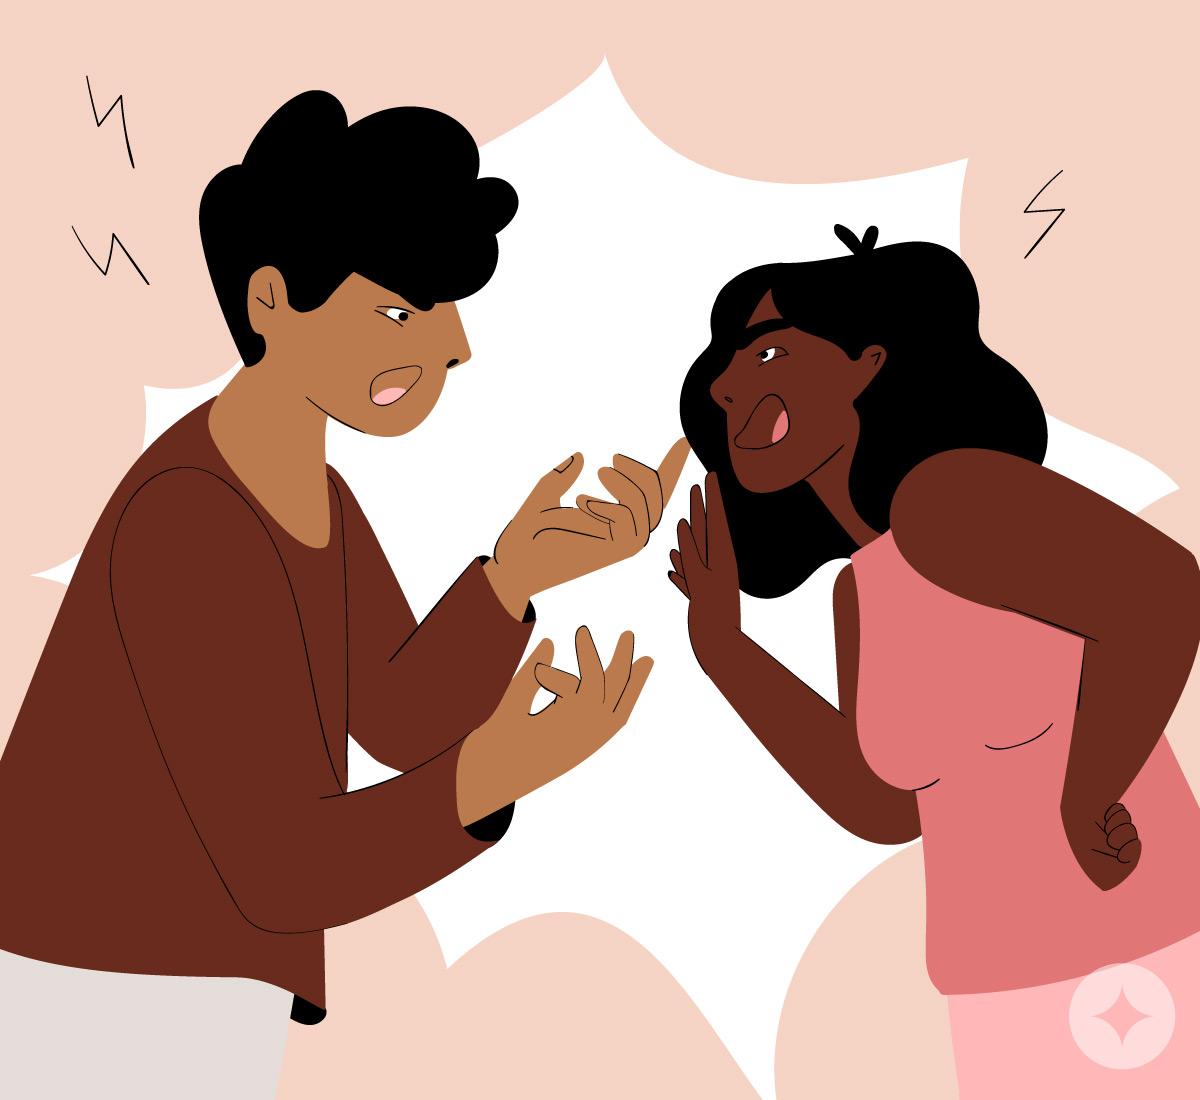 A couple arguing prior to make-up sex